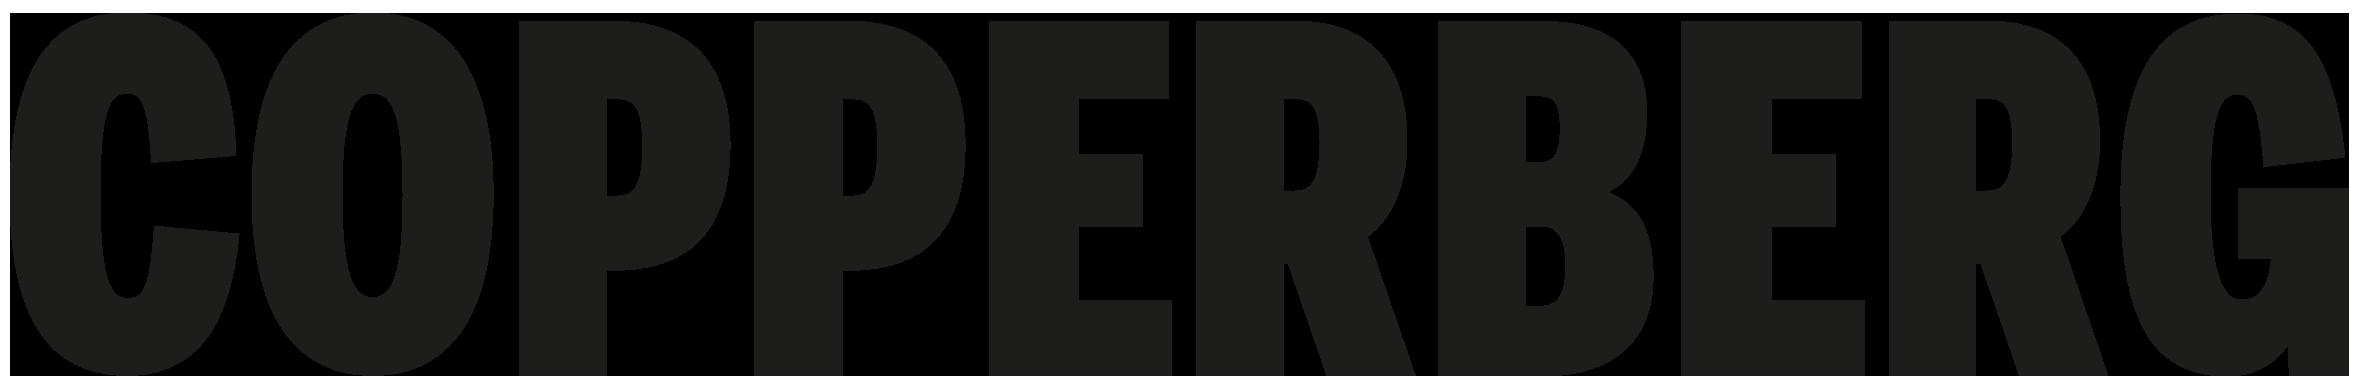 copperberg-logo